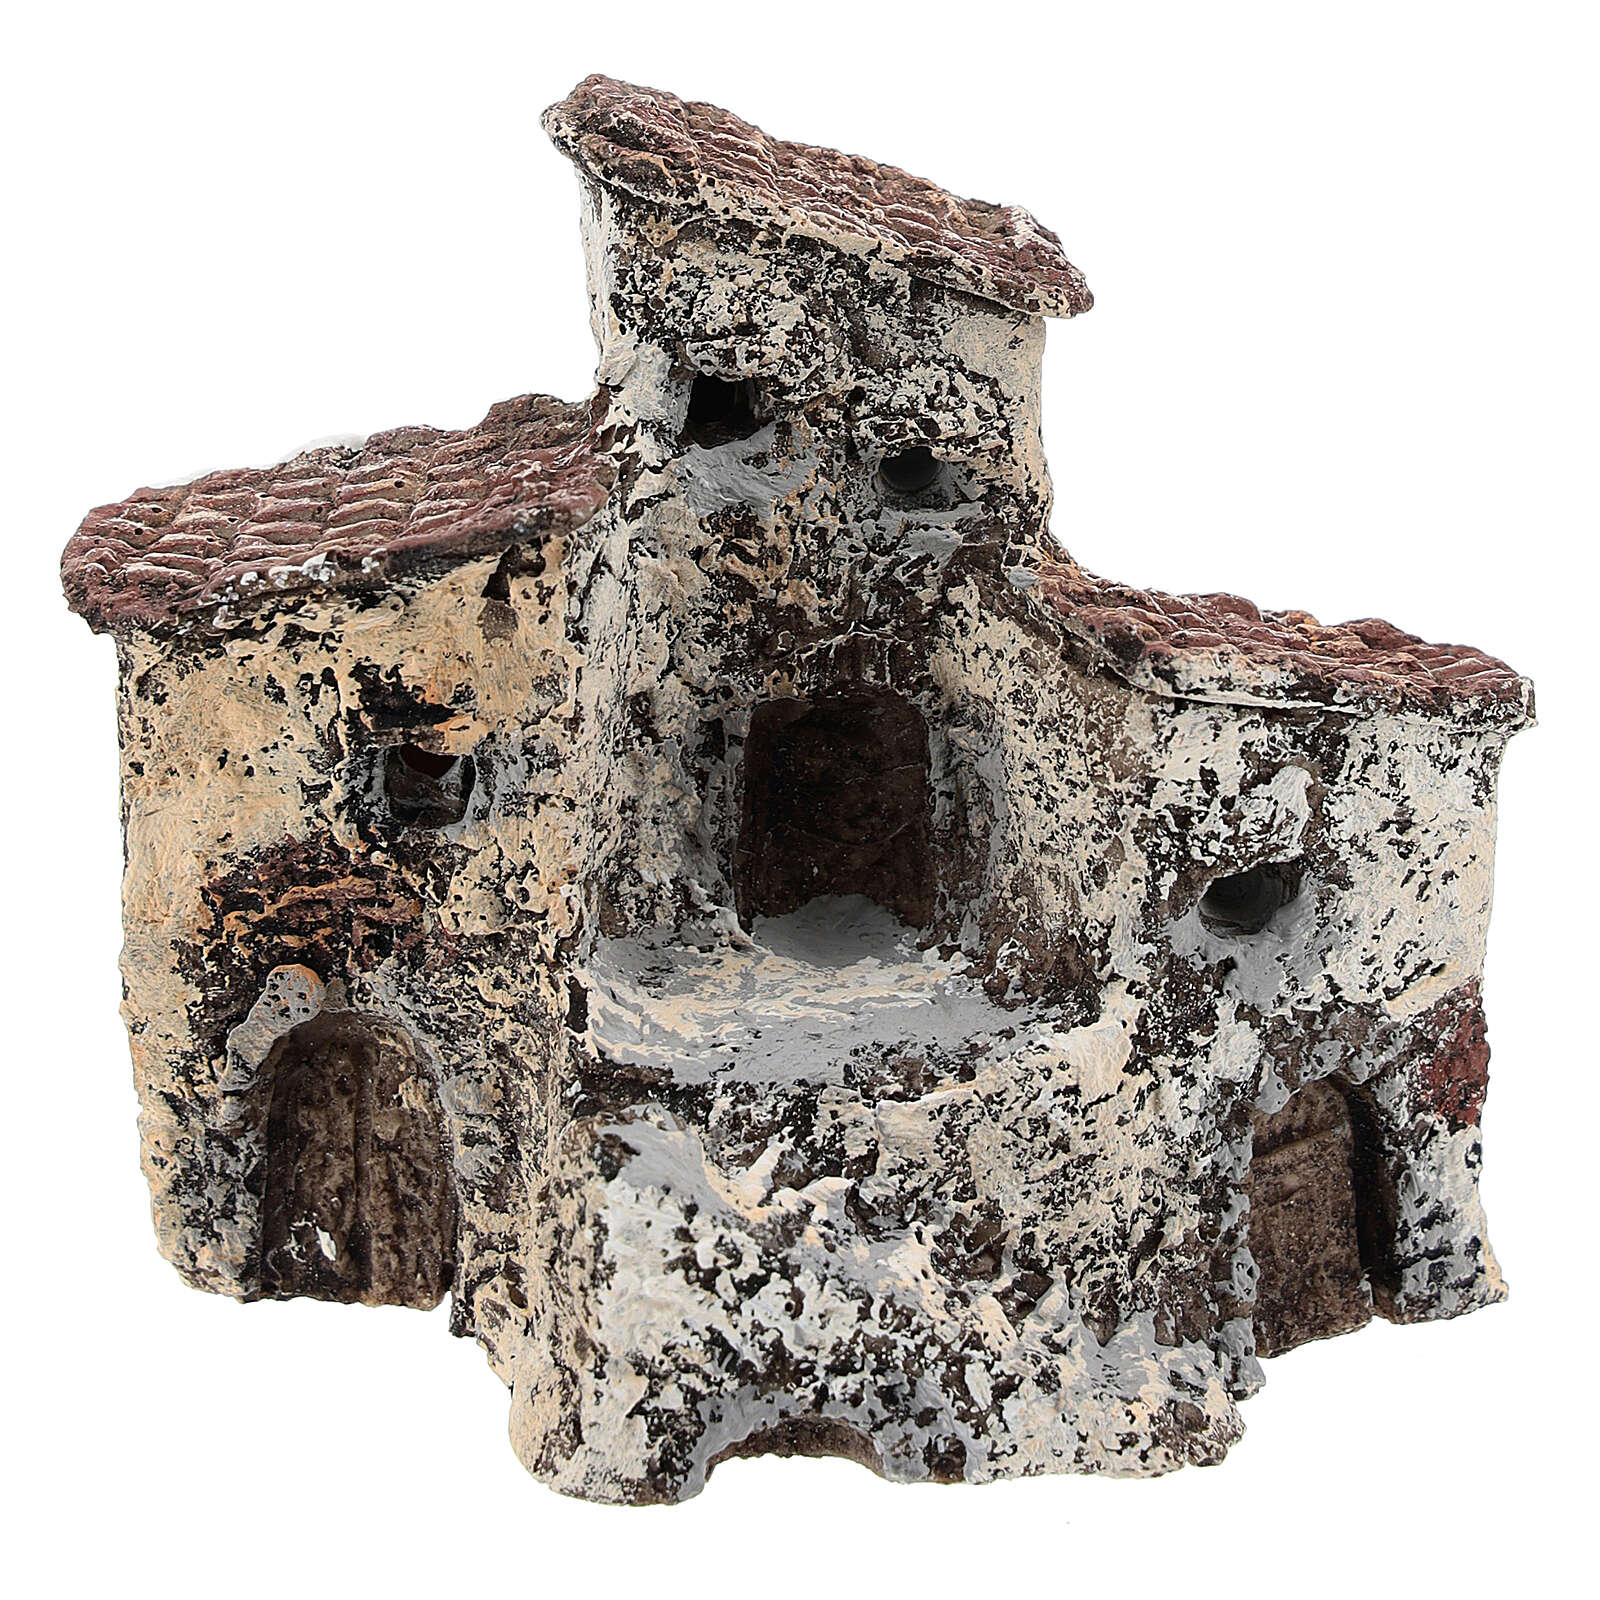 Antique village 10x10x5 cm, Neapolitan nativity 3-4 cm 4